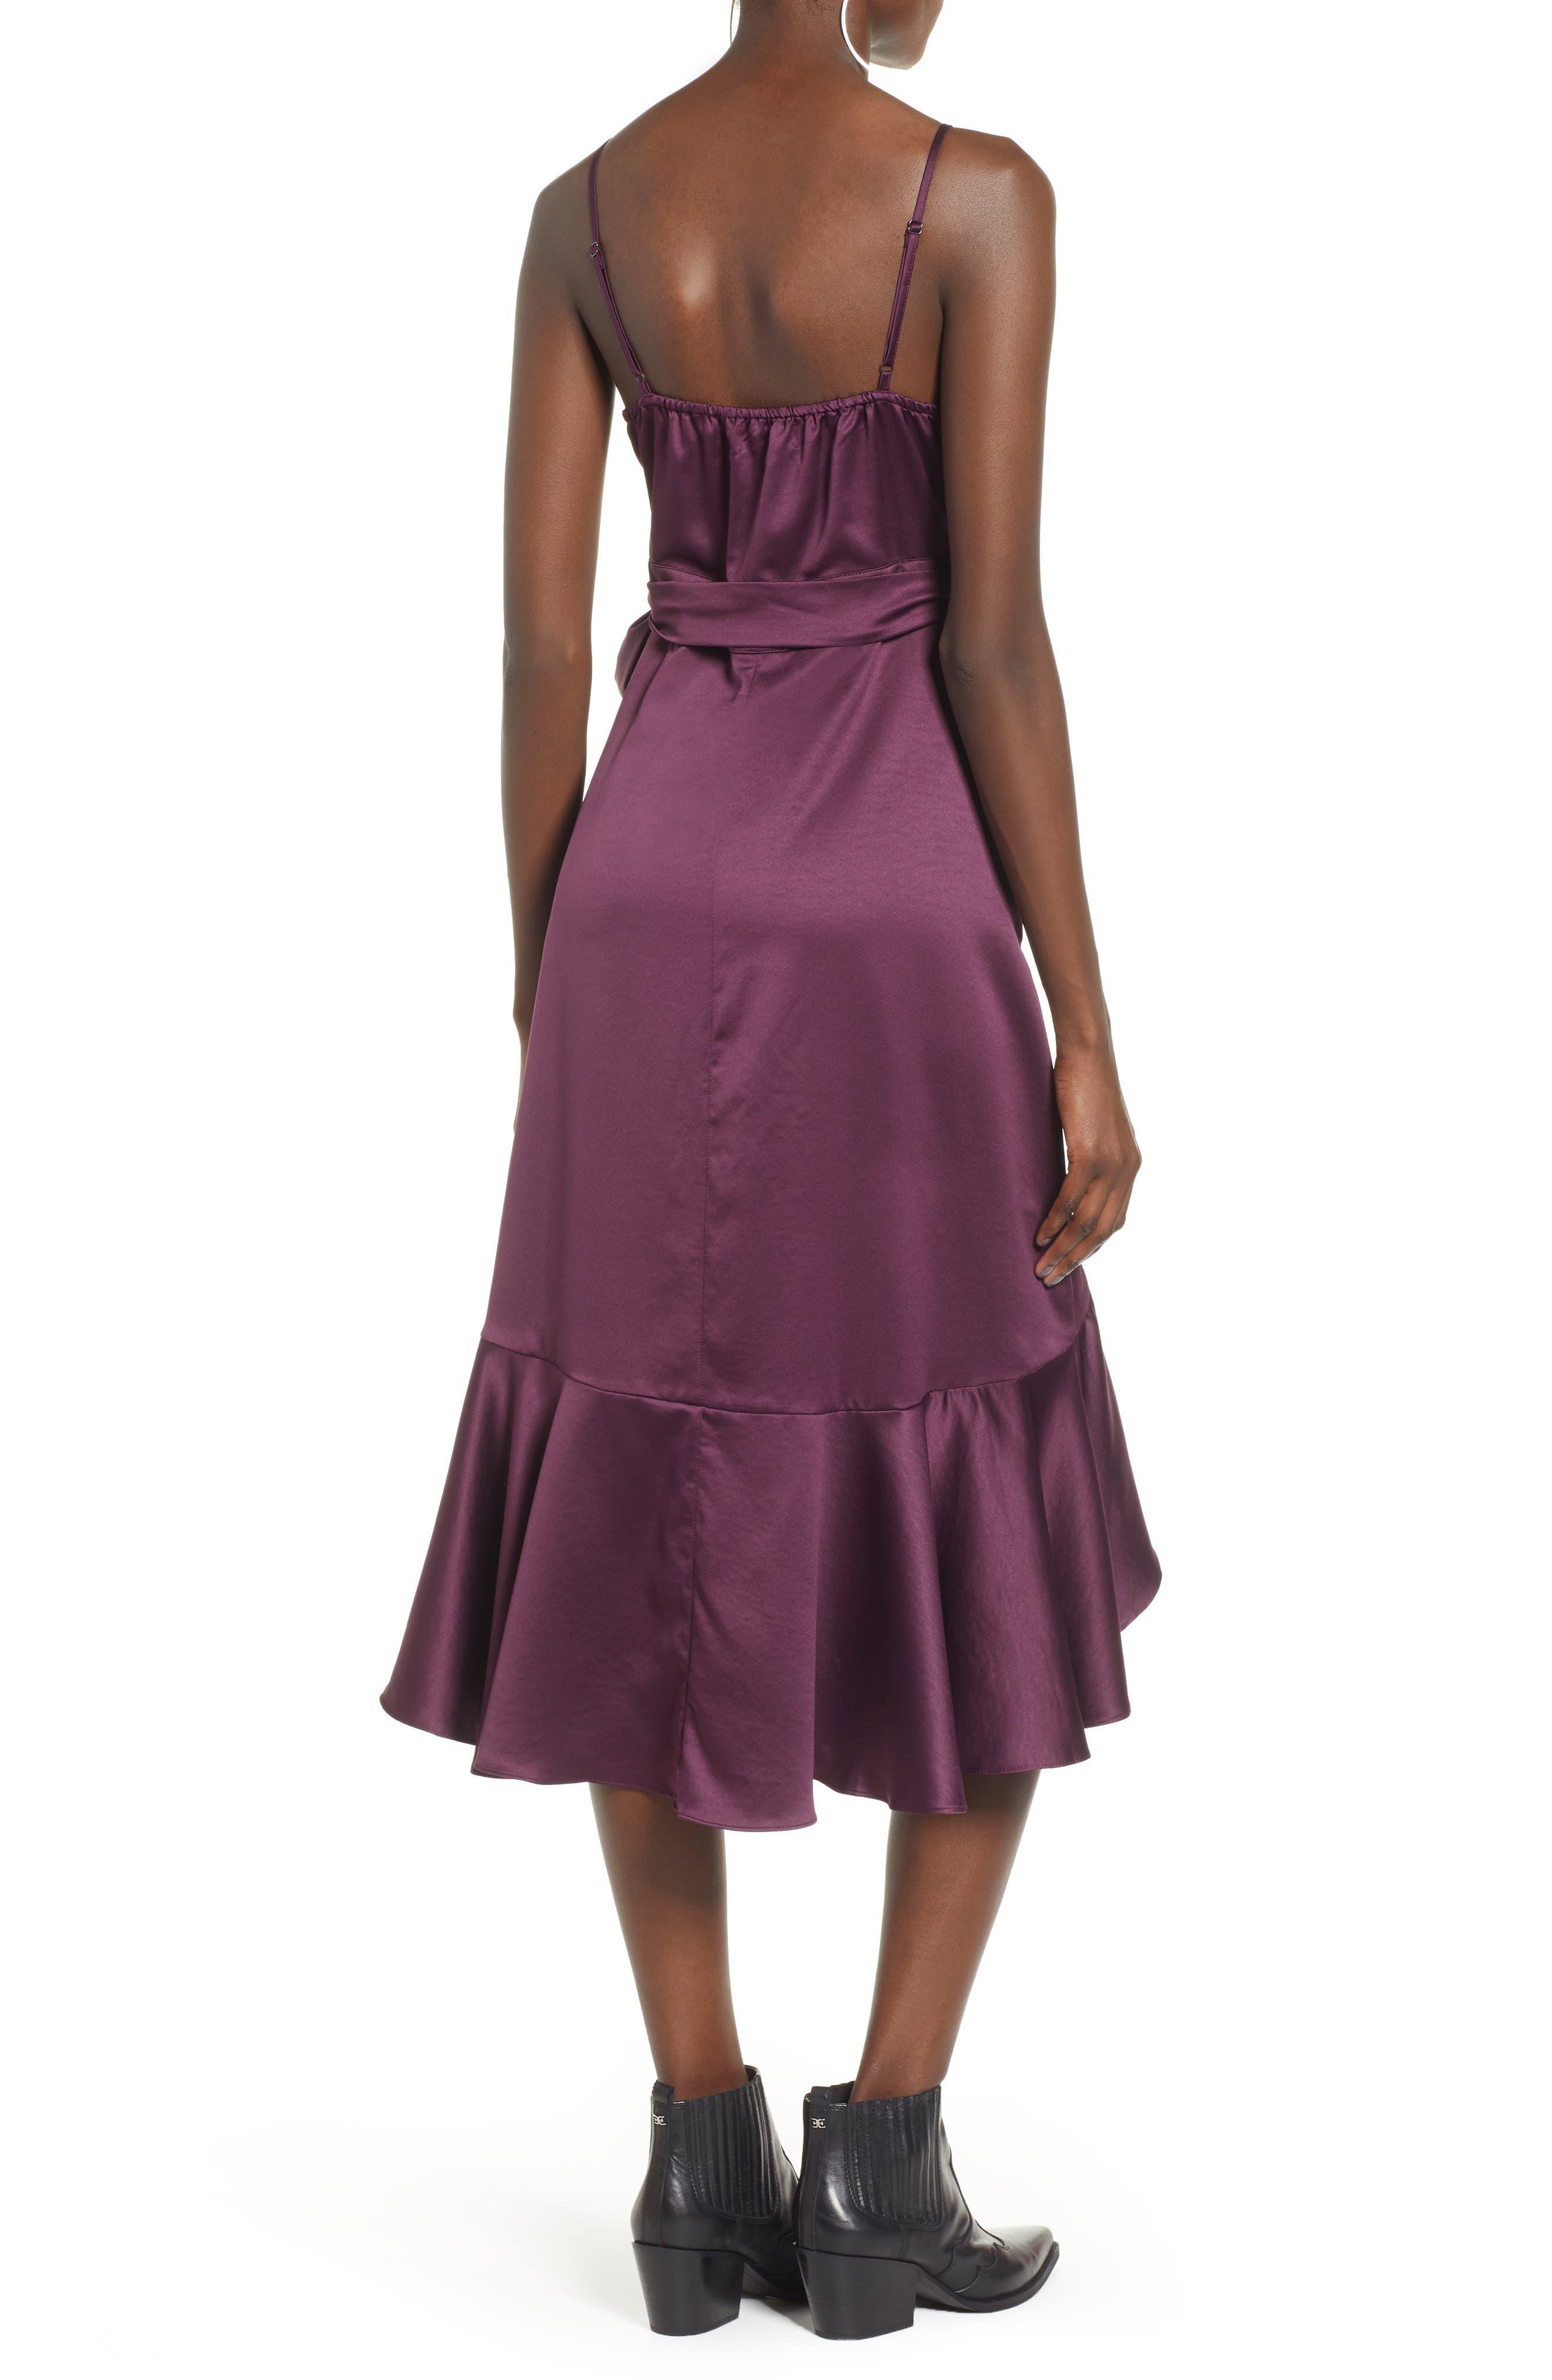 BAND OF GYPSIES,                             Payton Ruffled High/Low Dress,                             Alternate thumbnail 2, color,                             PLUM